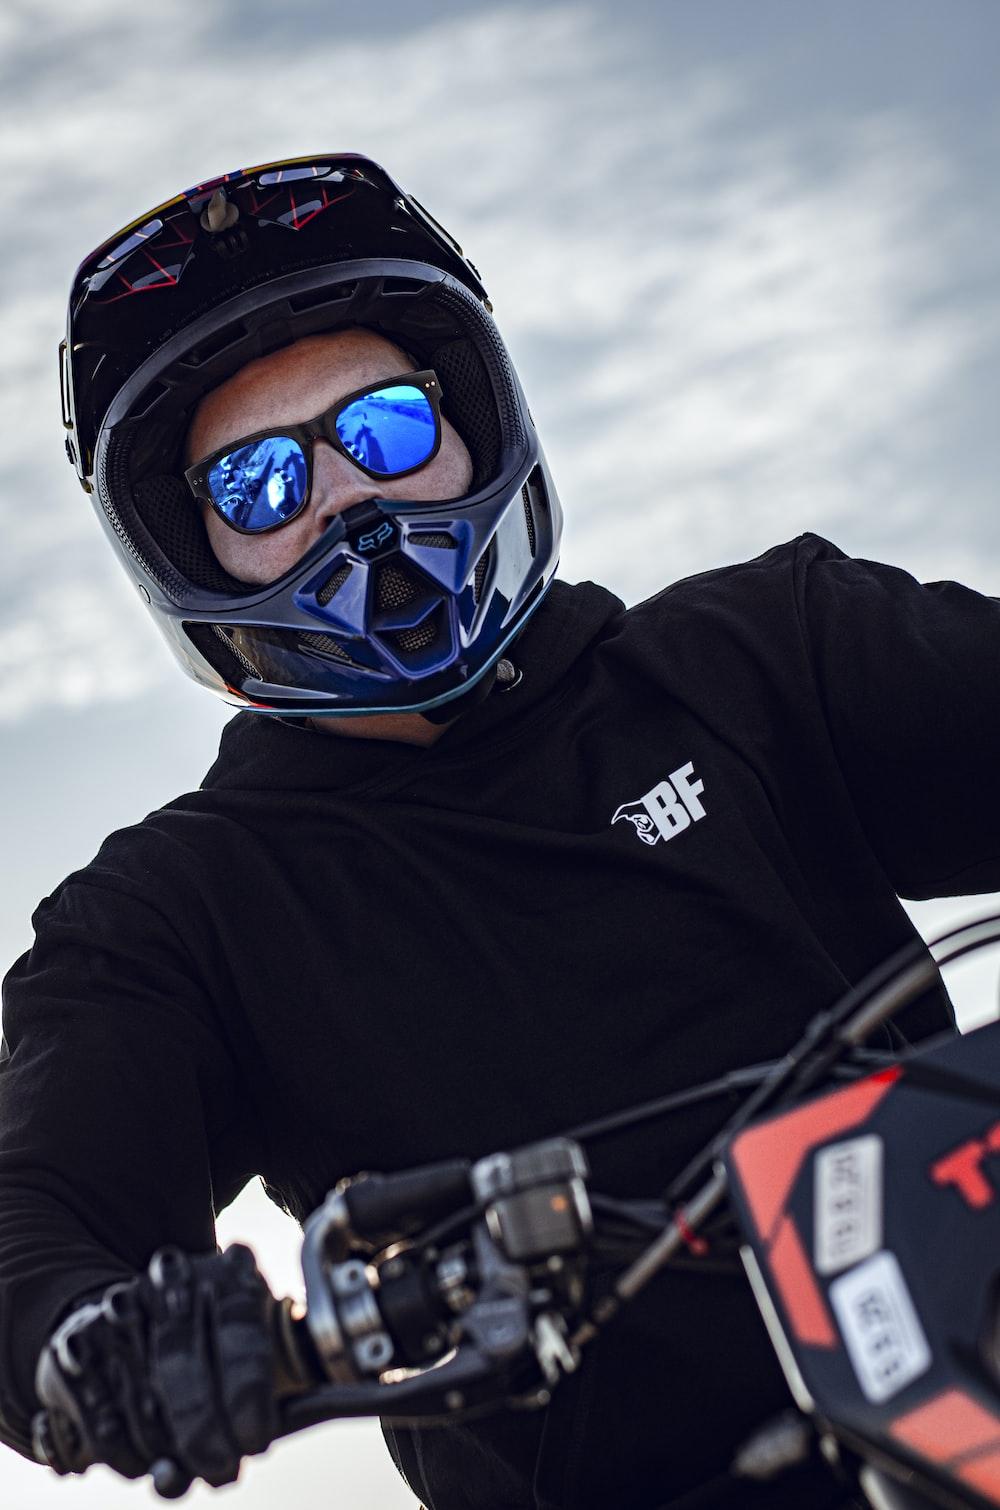 man in black jacket wearing blue helmet and black goggles